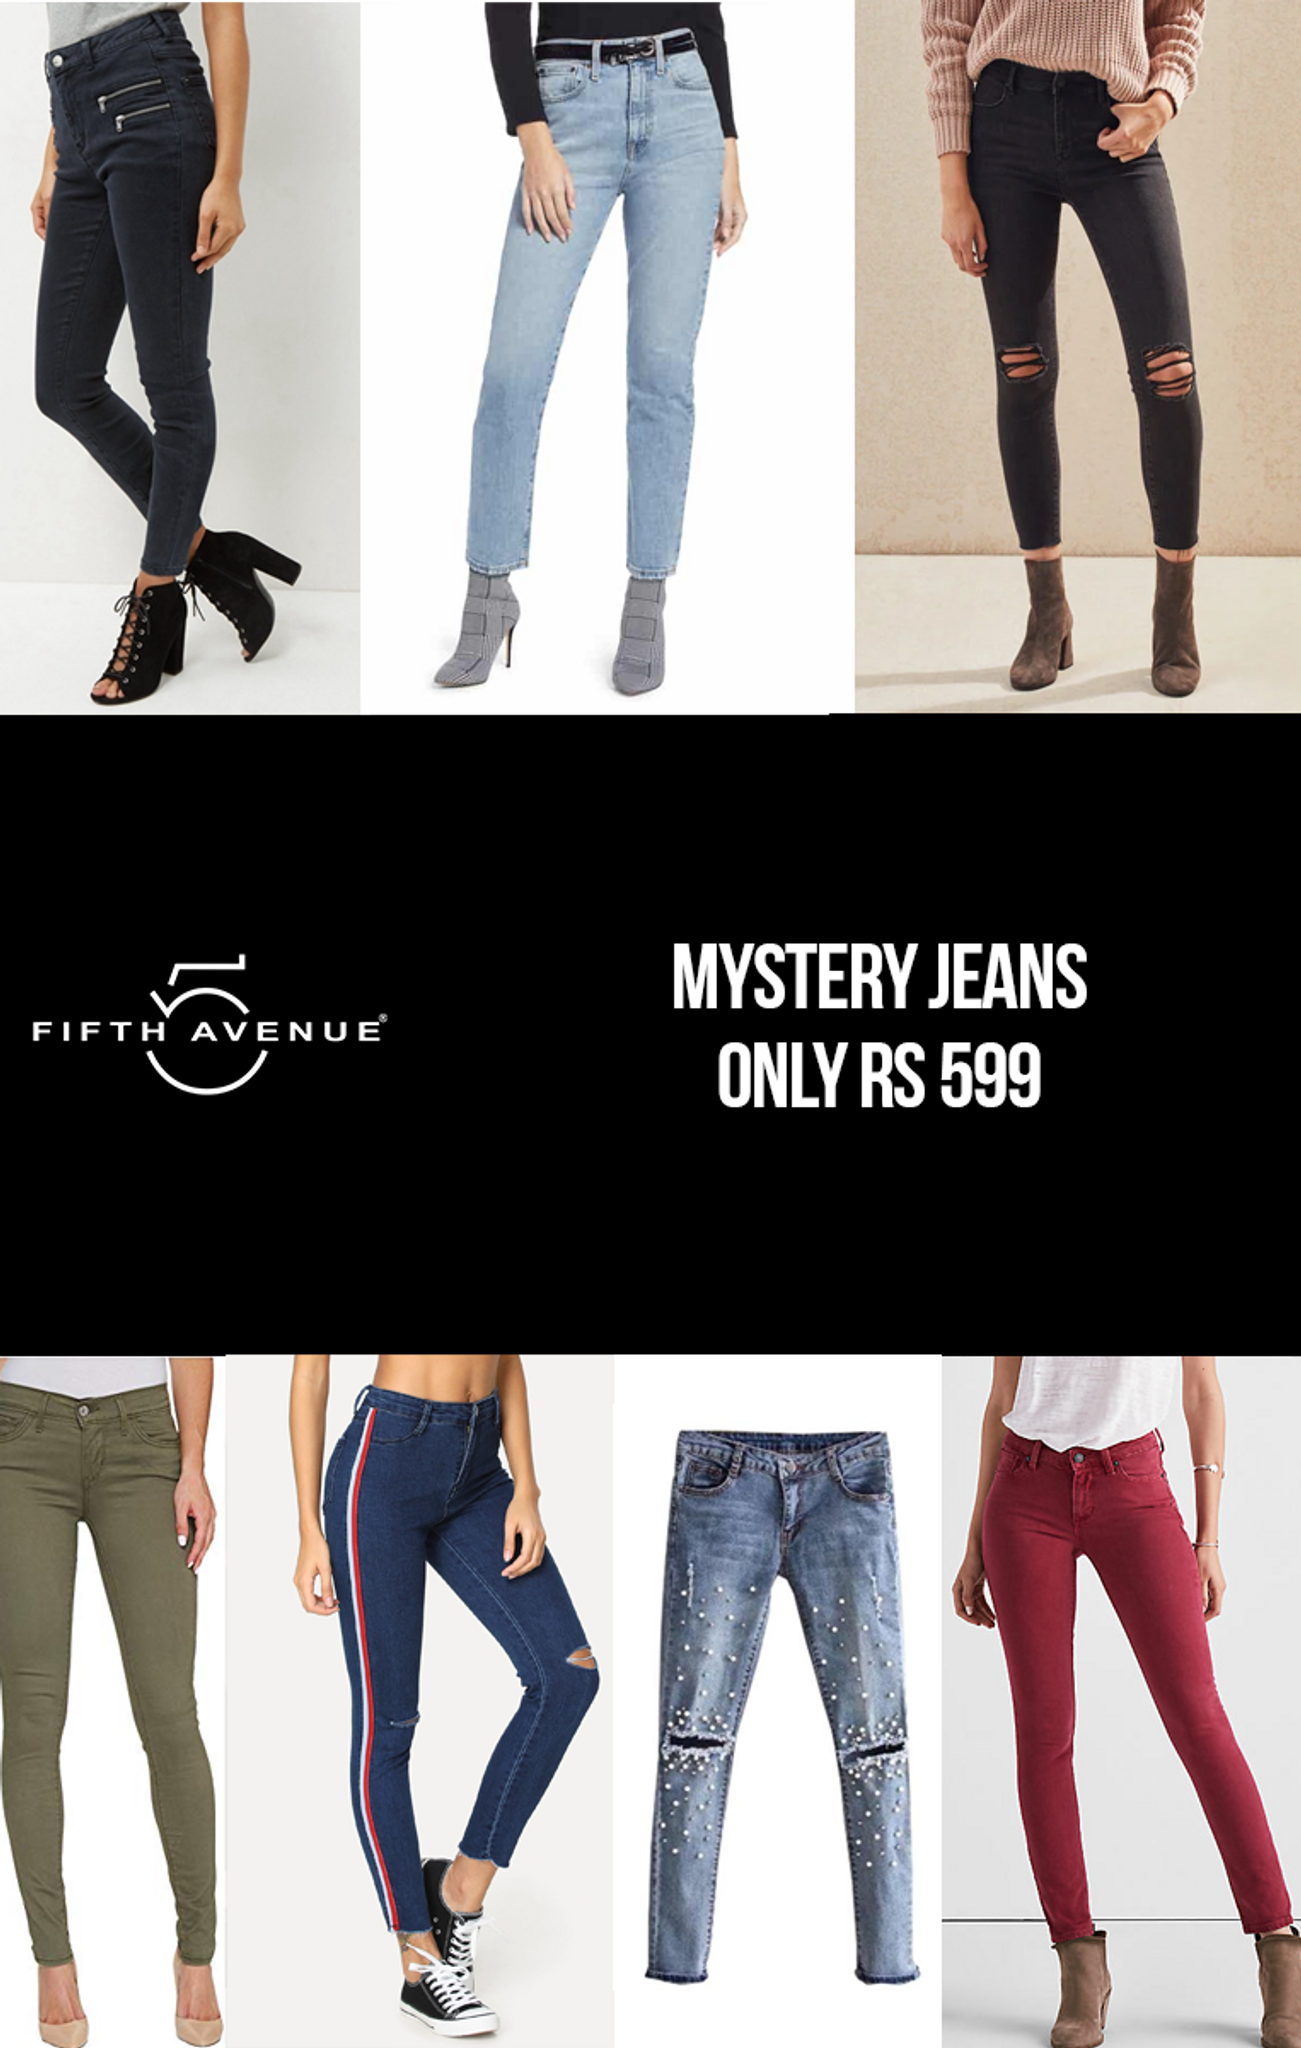 Fifth Avenue Women's Mystery Mania - Mystery Jeans